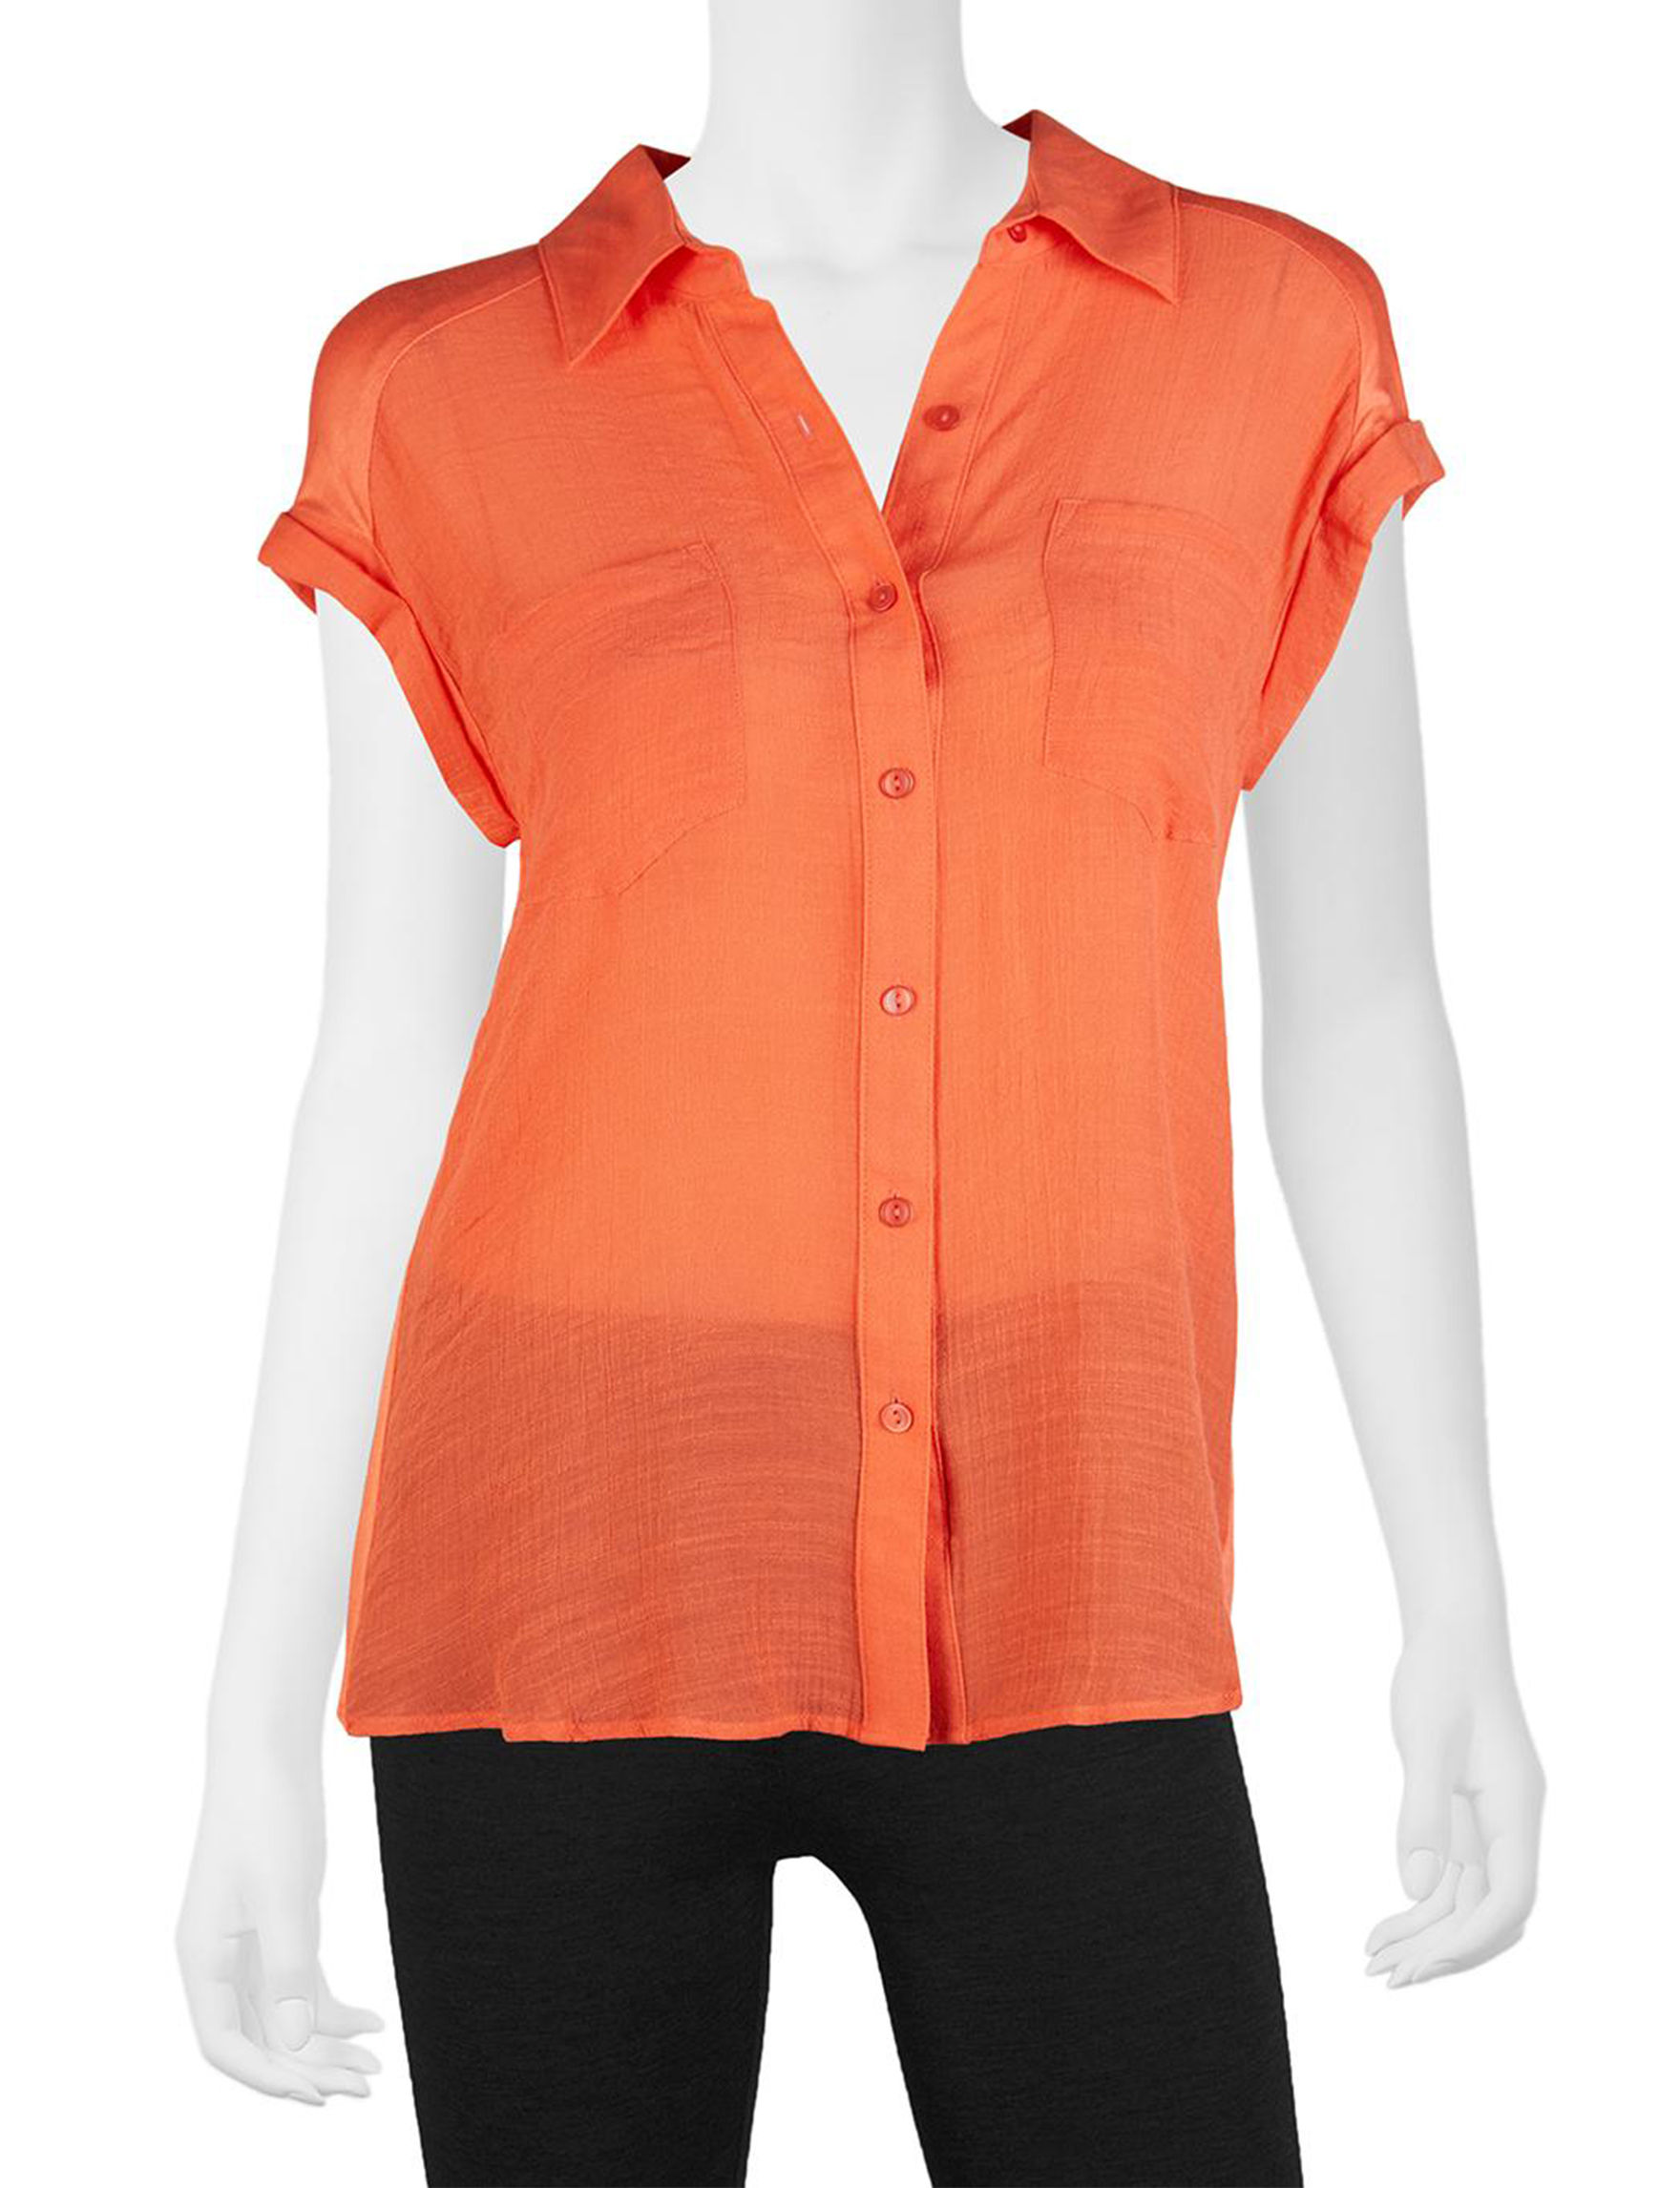 A. Byer Bright Orange Shirts & Blouses